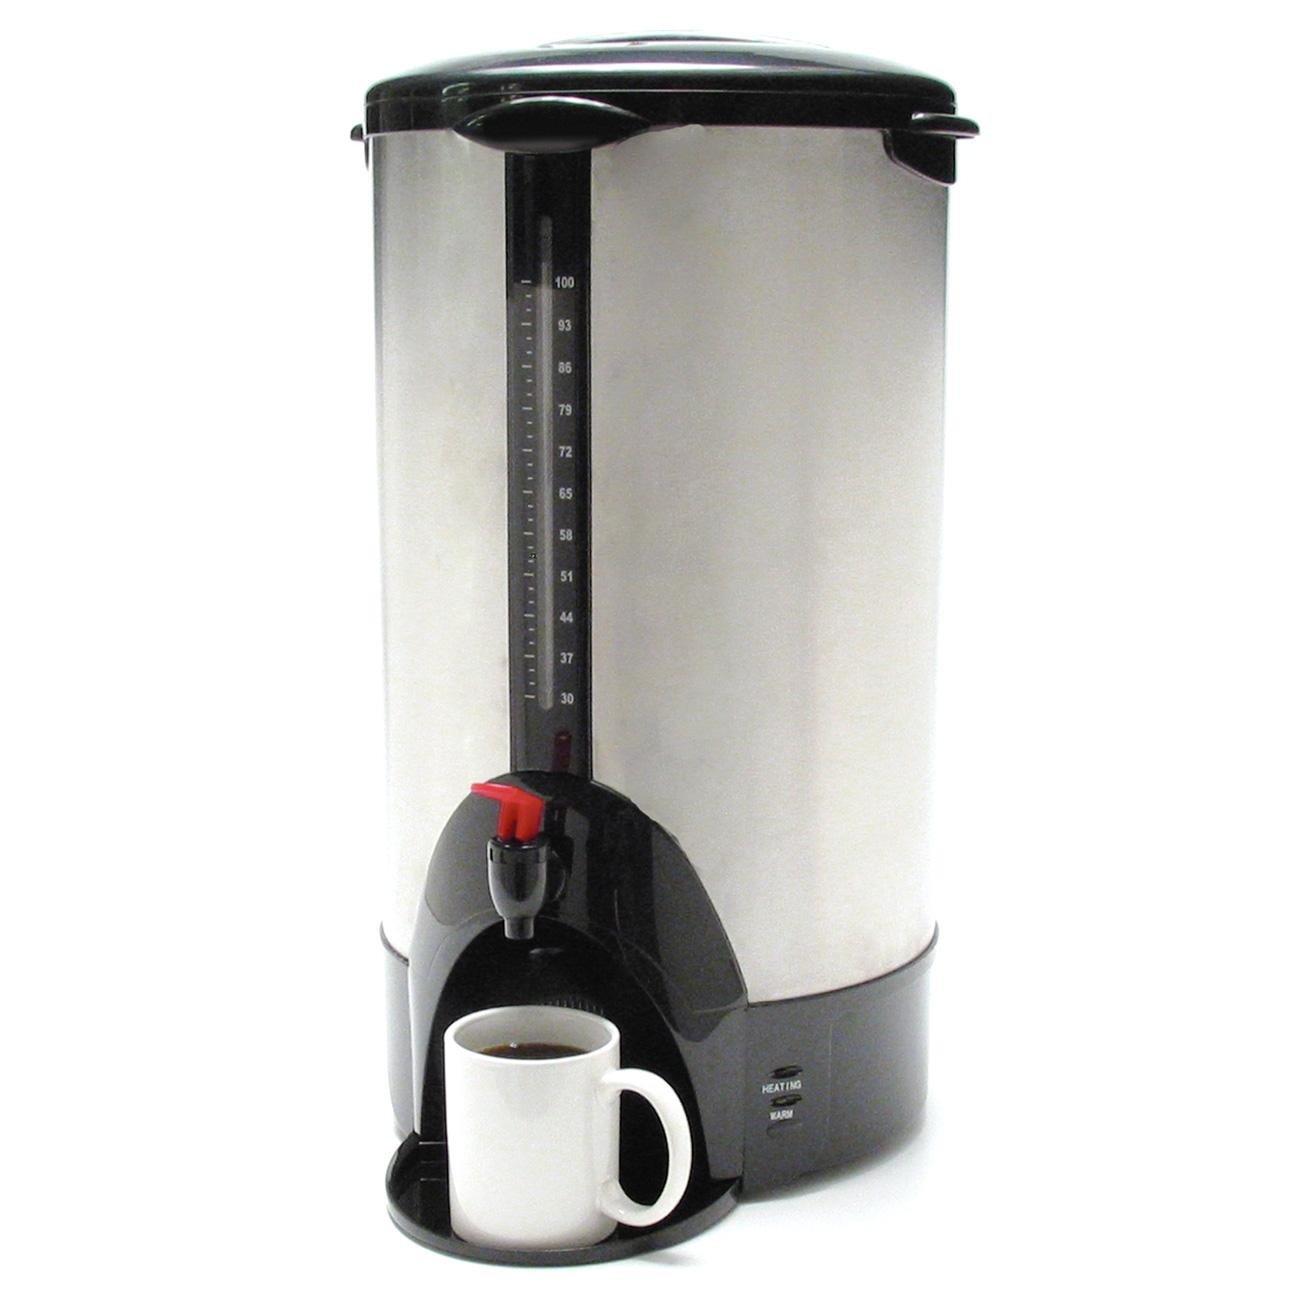 Image of Coffee Pro CFPCP100 Coffee Makers, 12.5' Length, 12.5' Width, 13.3' Height, 23 lb Coffee Urns